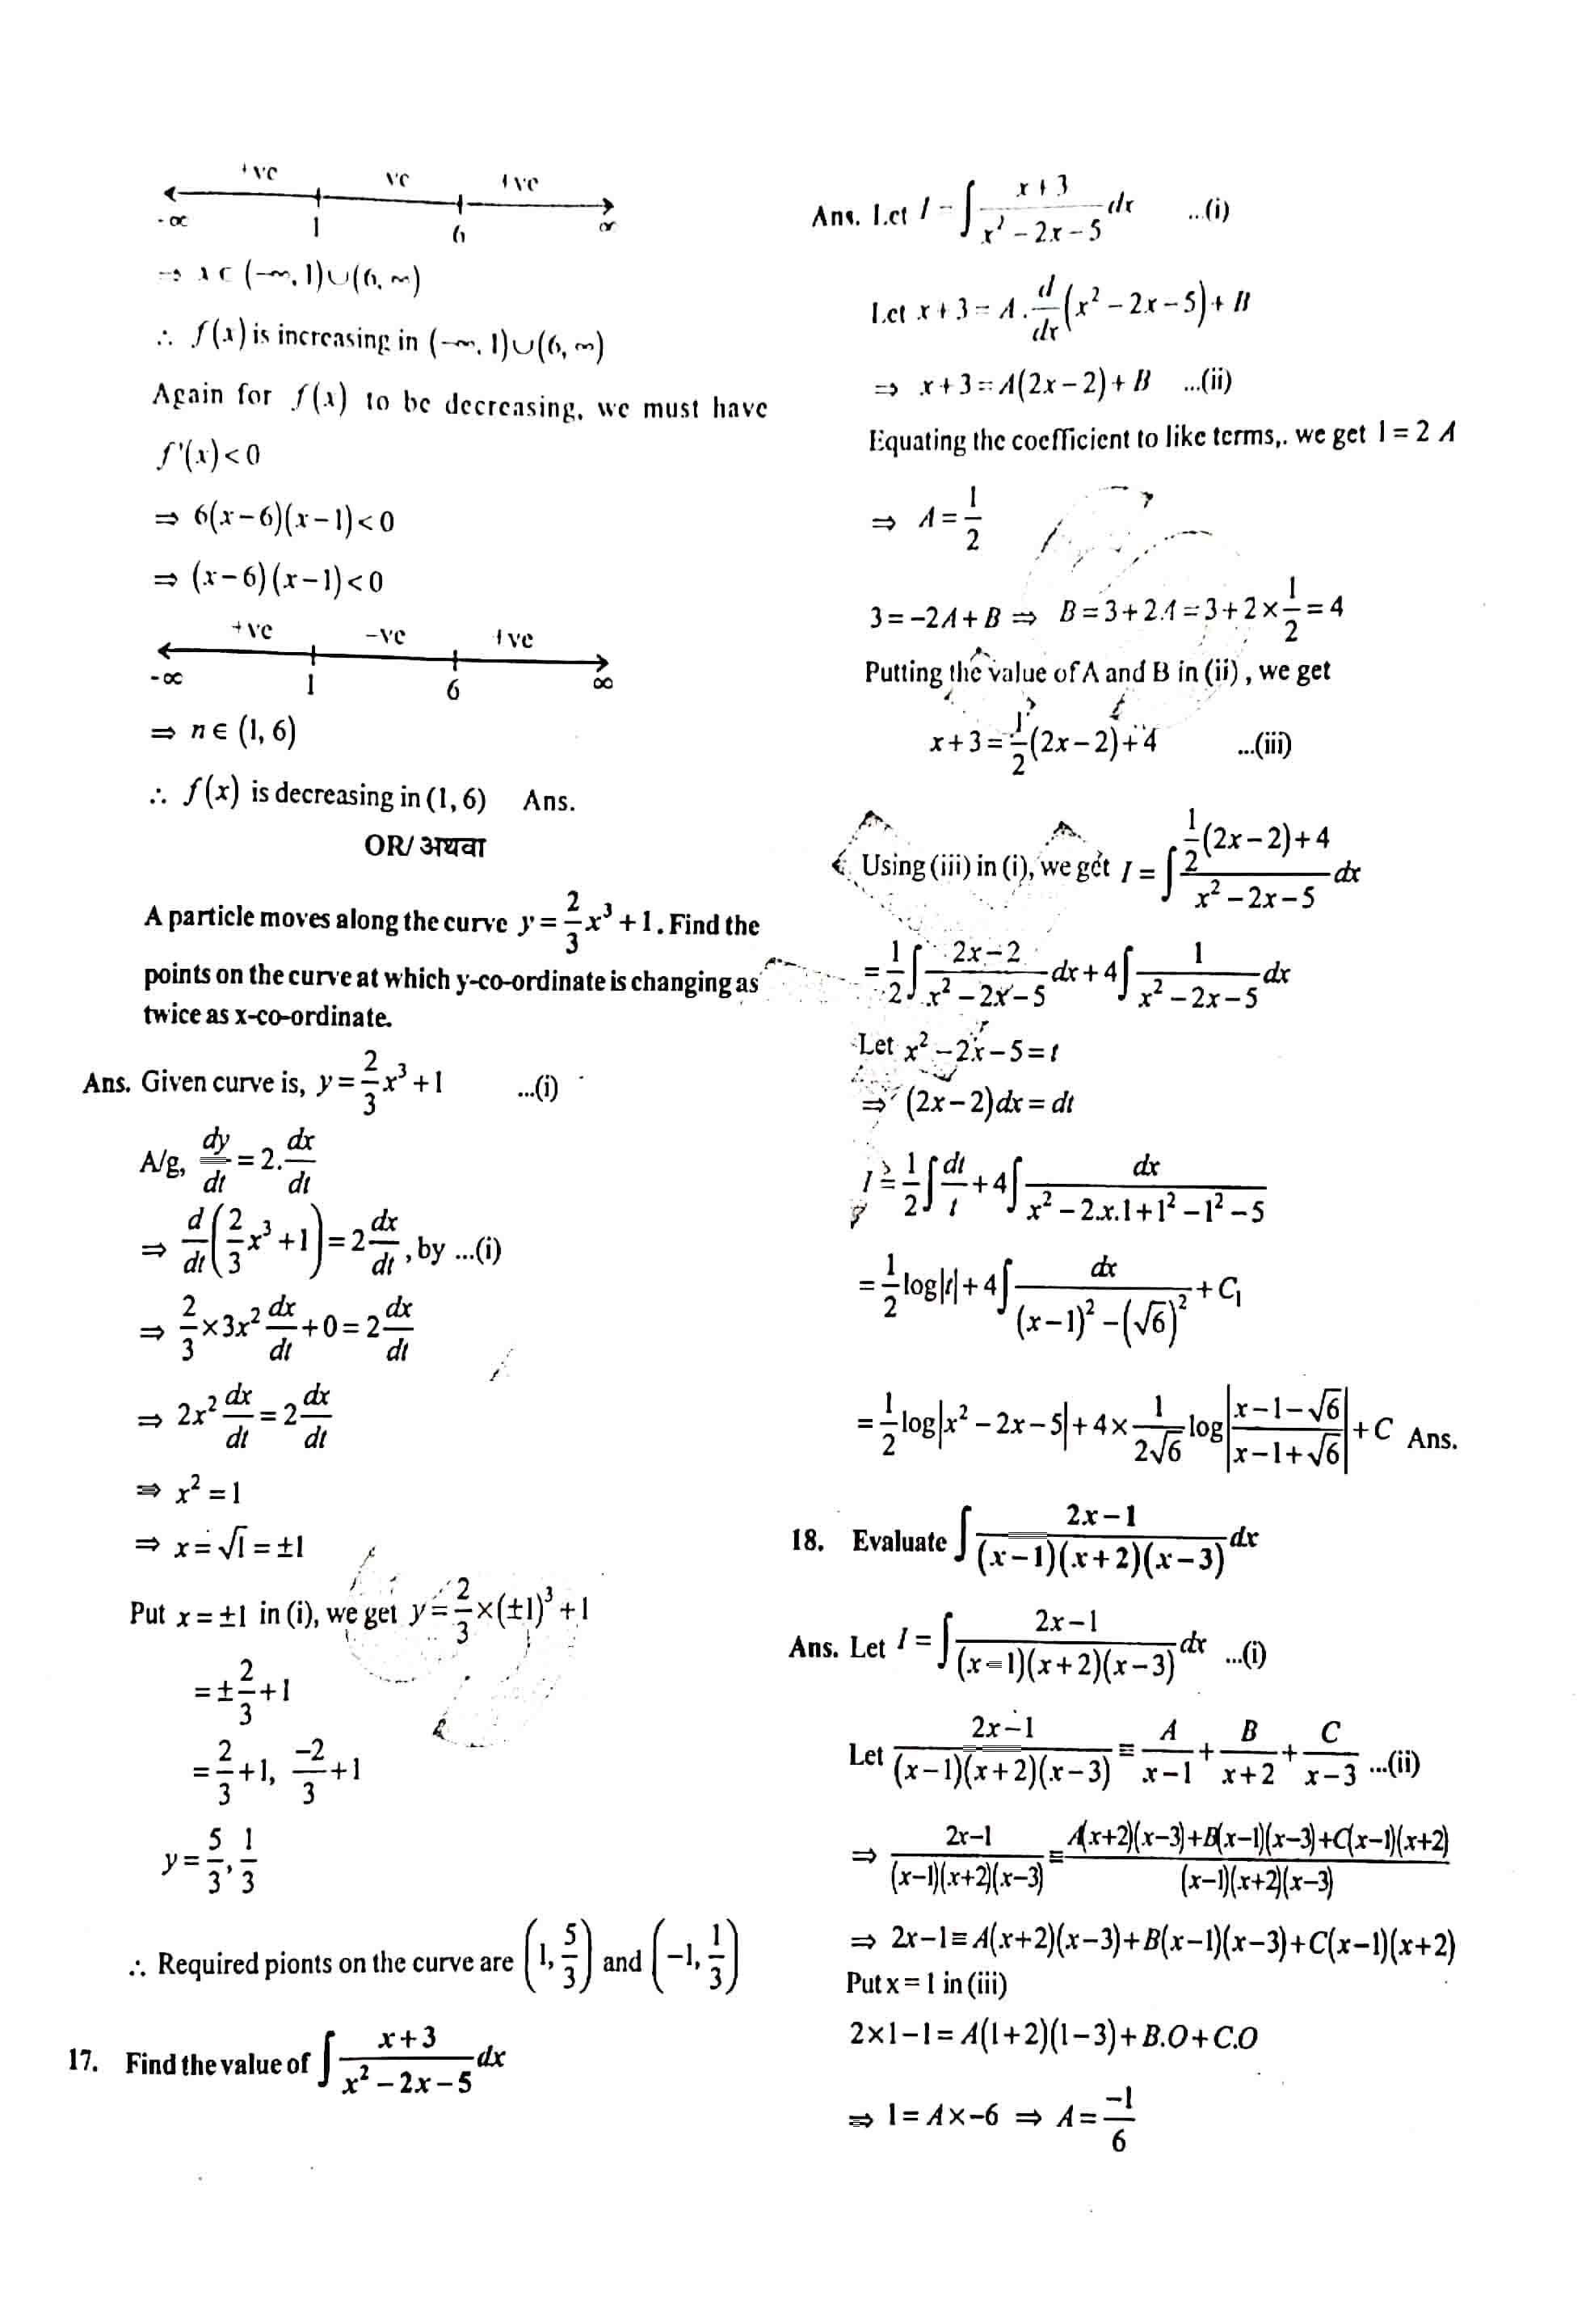 JAC Class 12 math 2019 Question Paper 05